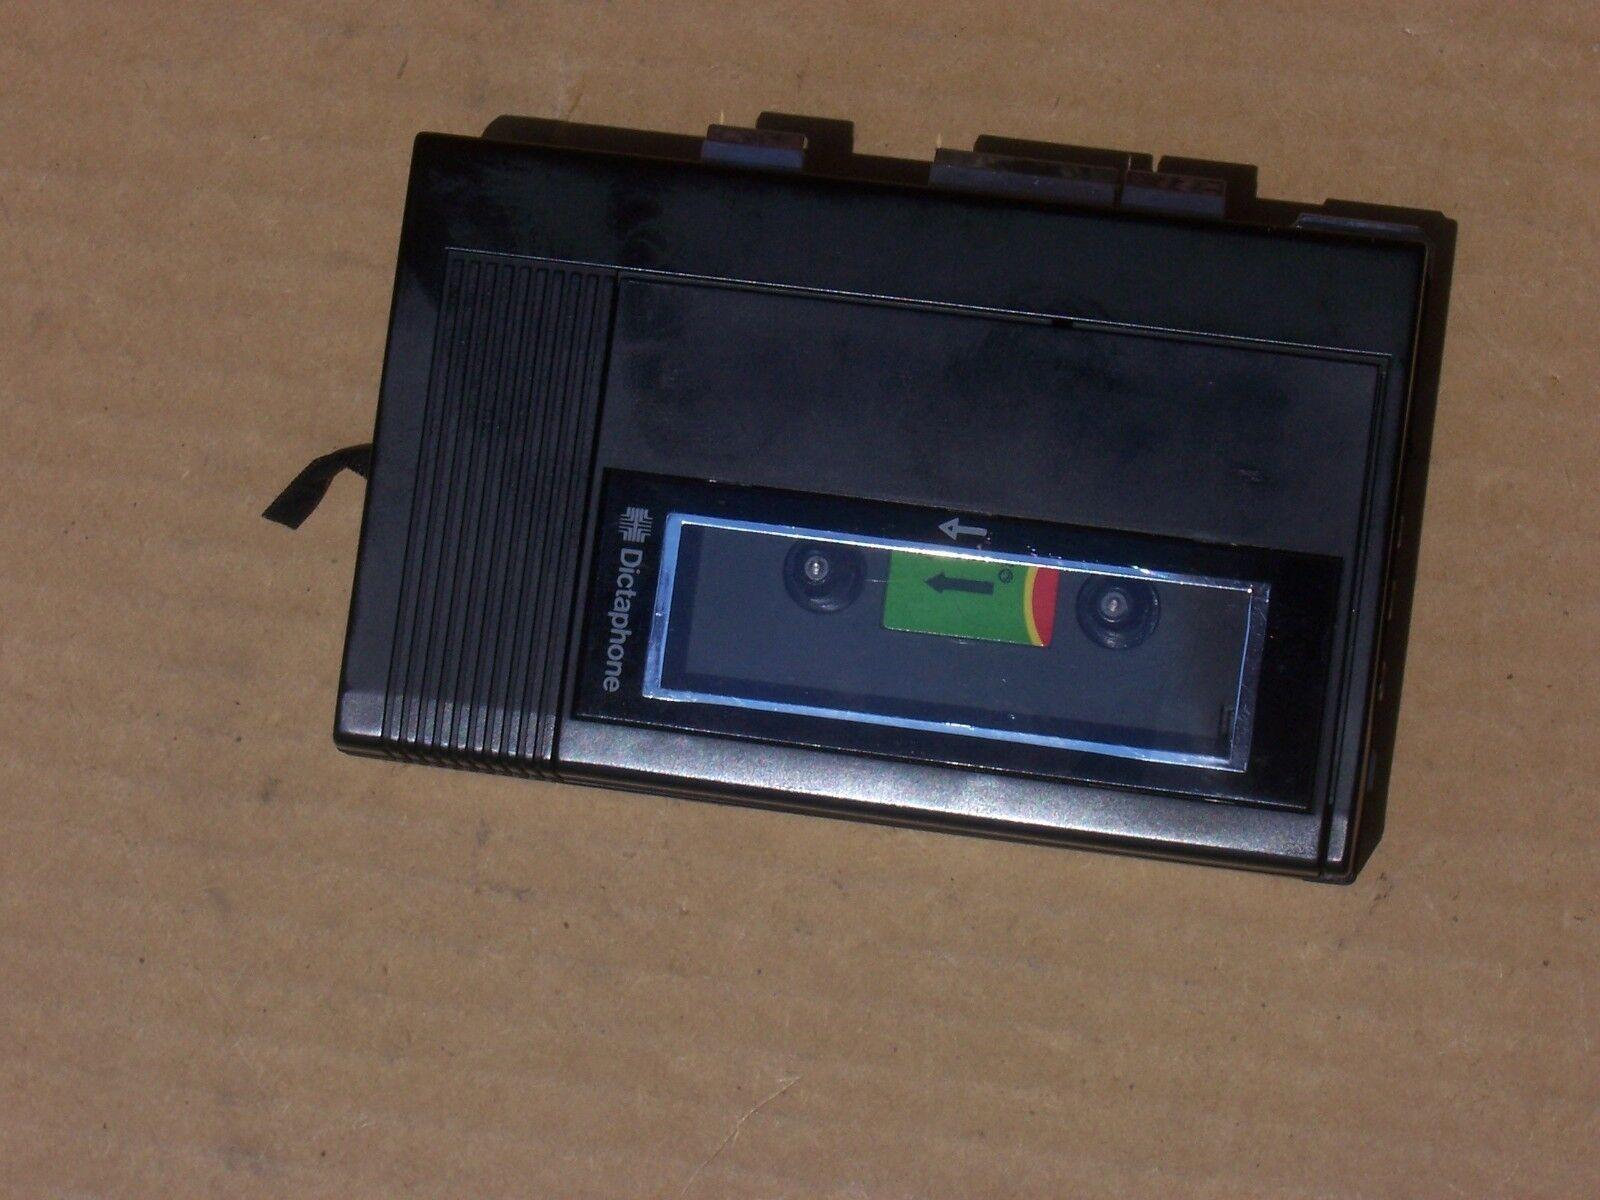 Dictaphone 2240 Standard Cassette  Portable Handheld Recorder/Dictator